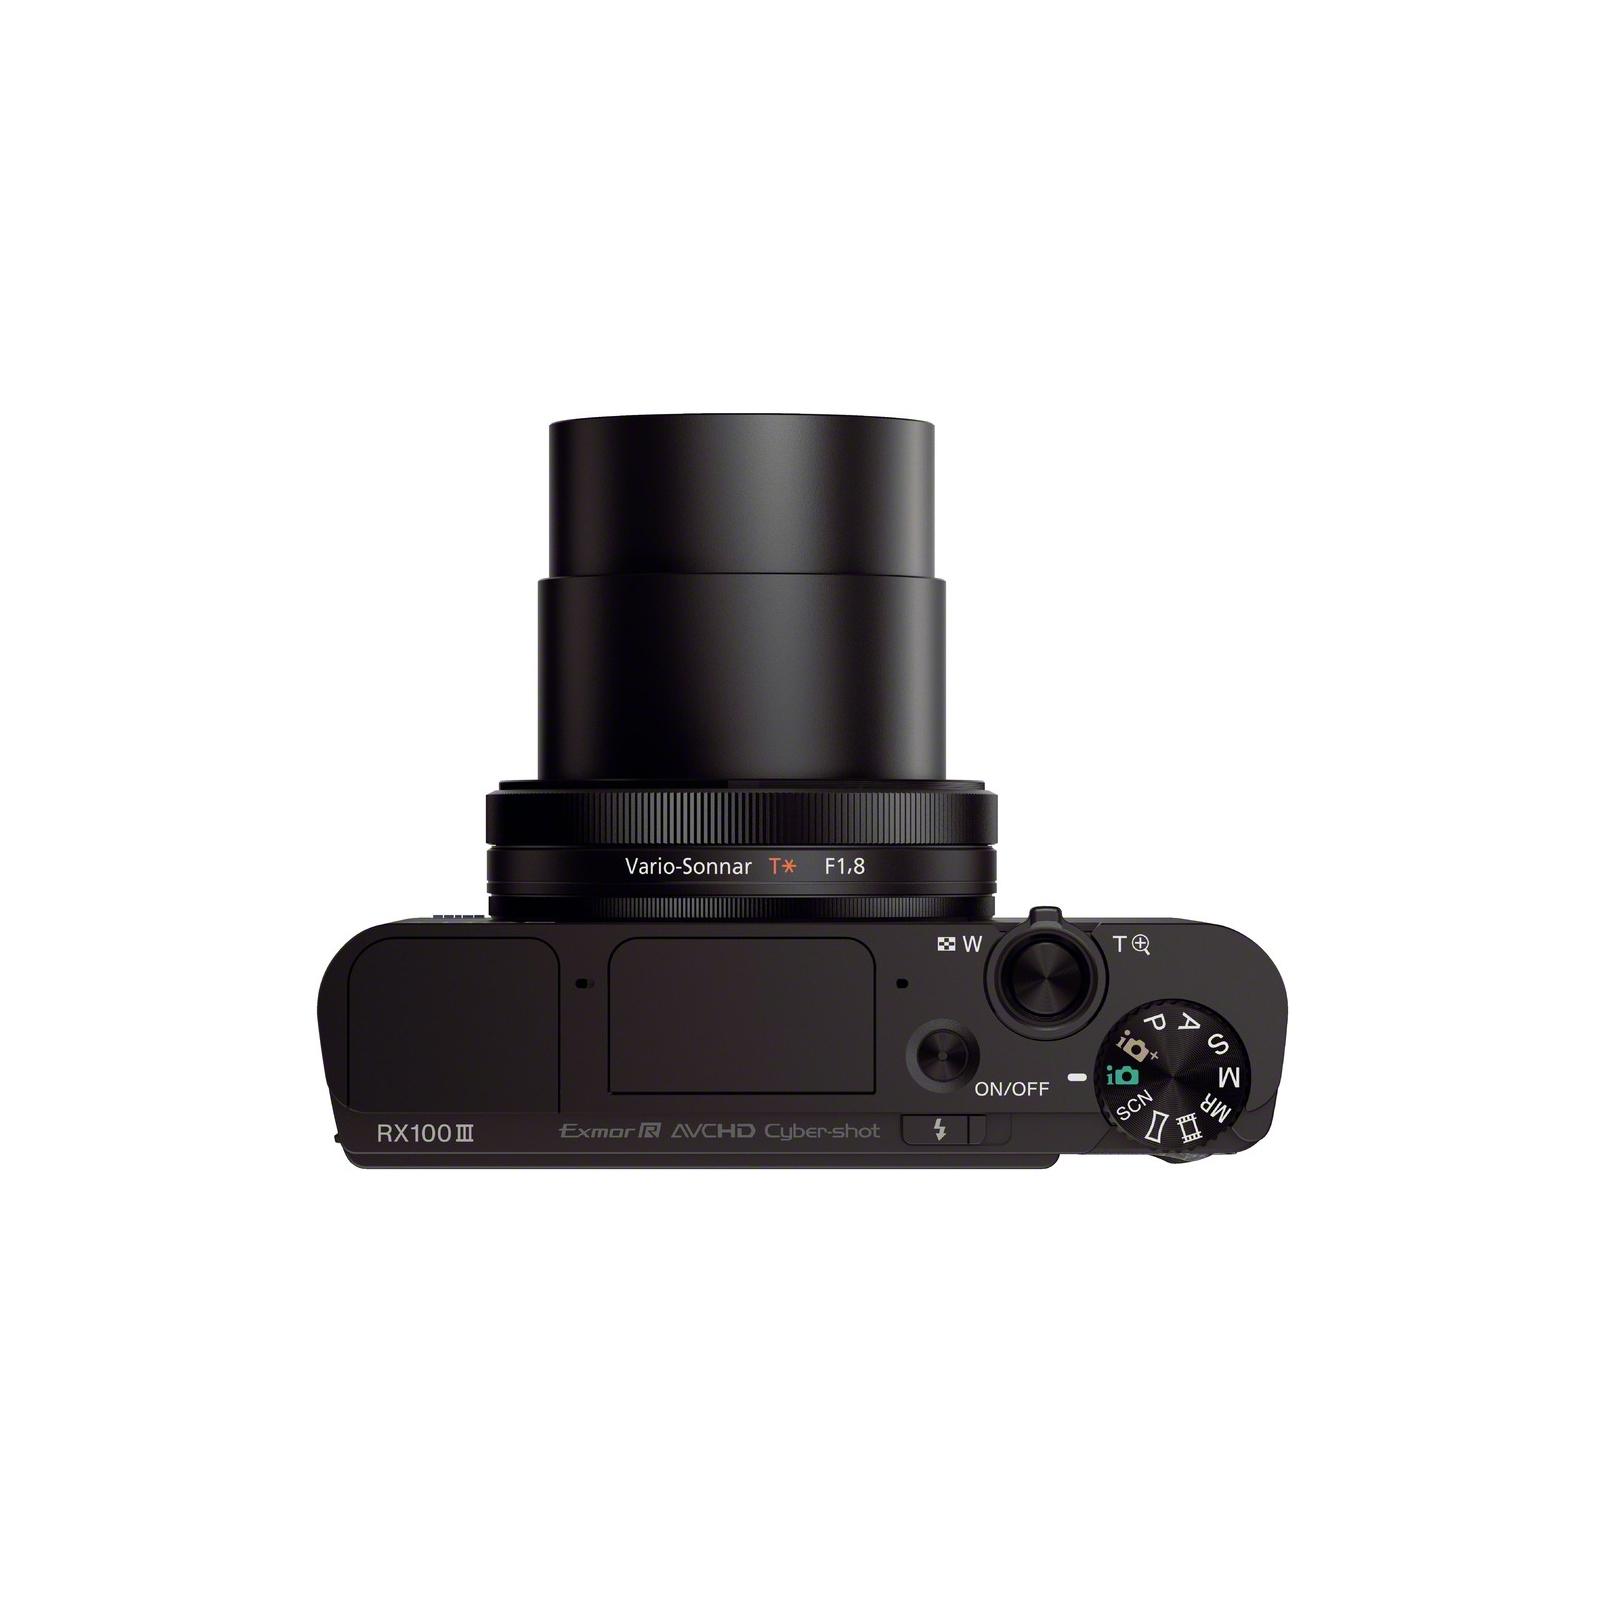 Цифровий фотоапарат SONY Cyber-shot DSC-RX100 Mark III (DSCRX100M3.RU3) зображення 4